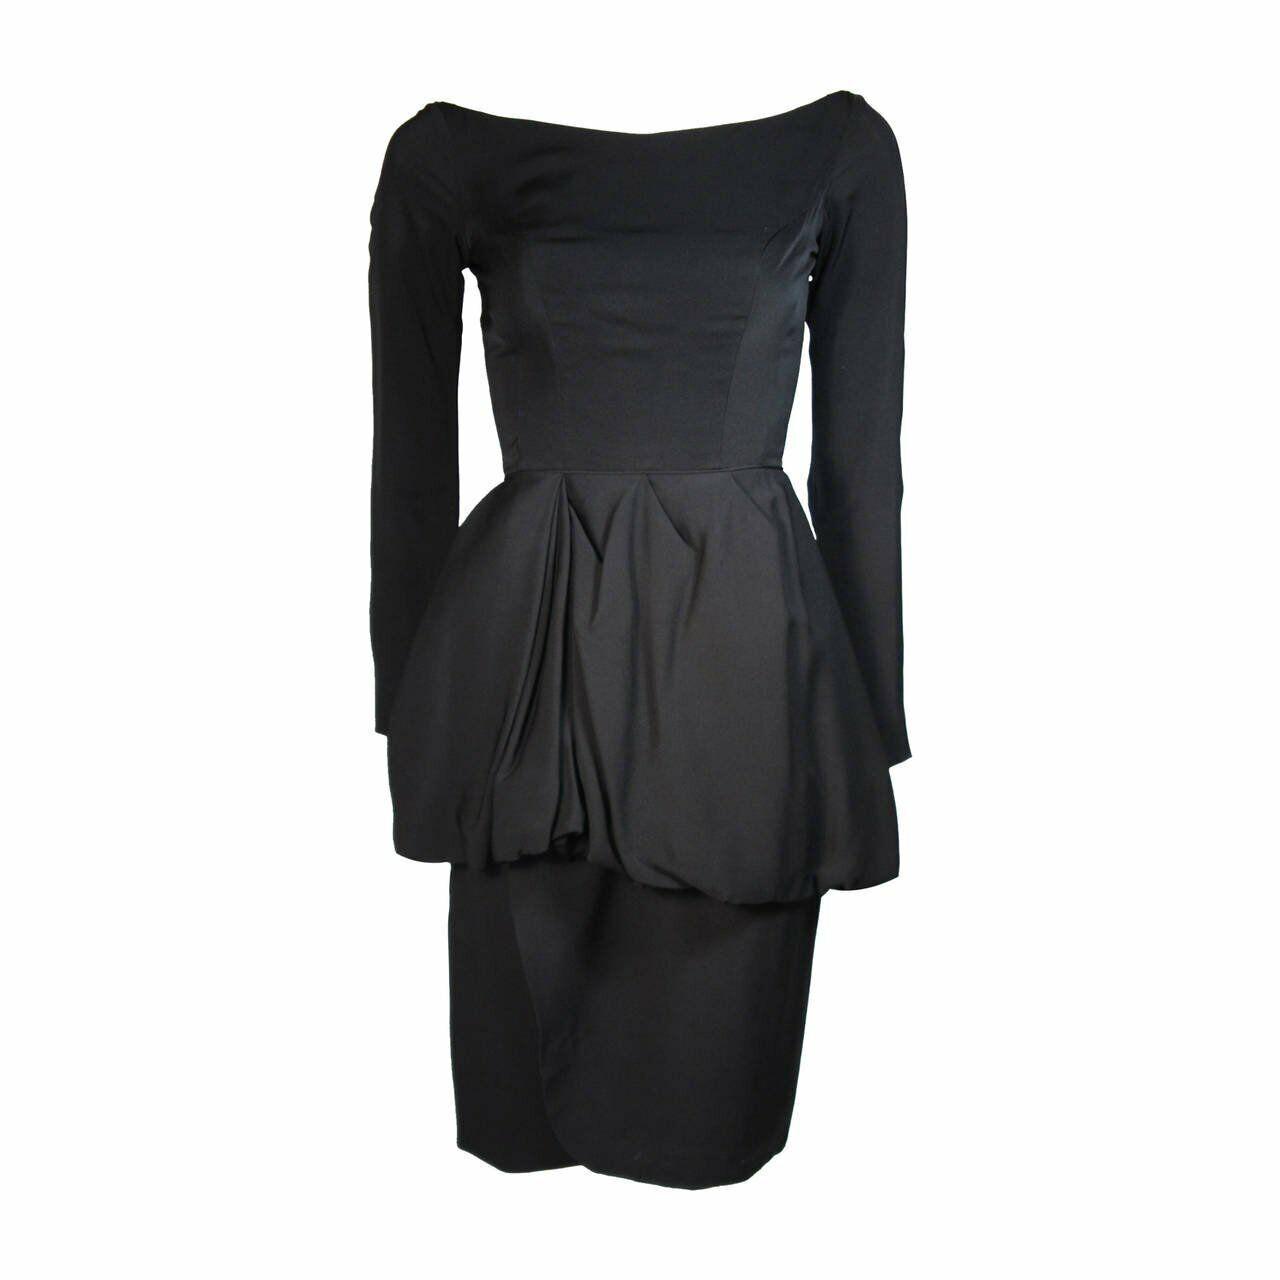 CEIL CHAPMAN Black Draped Princess Style Waist Dr… - image 1